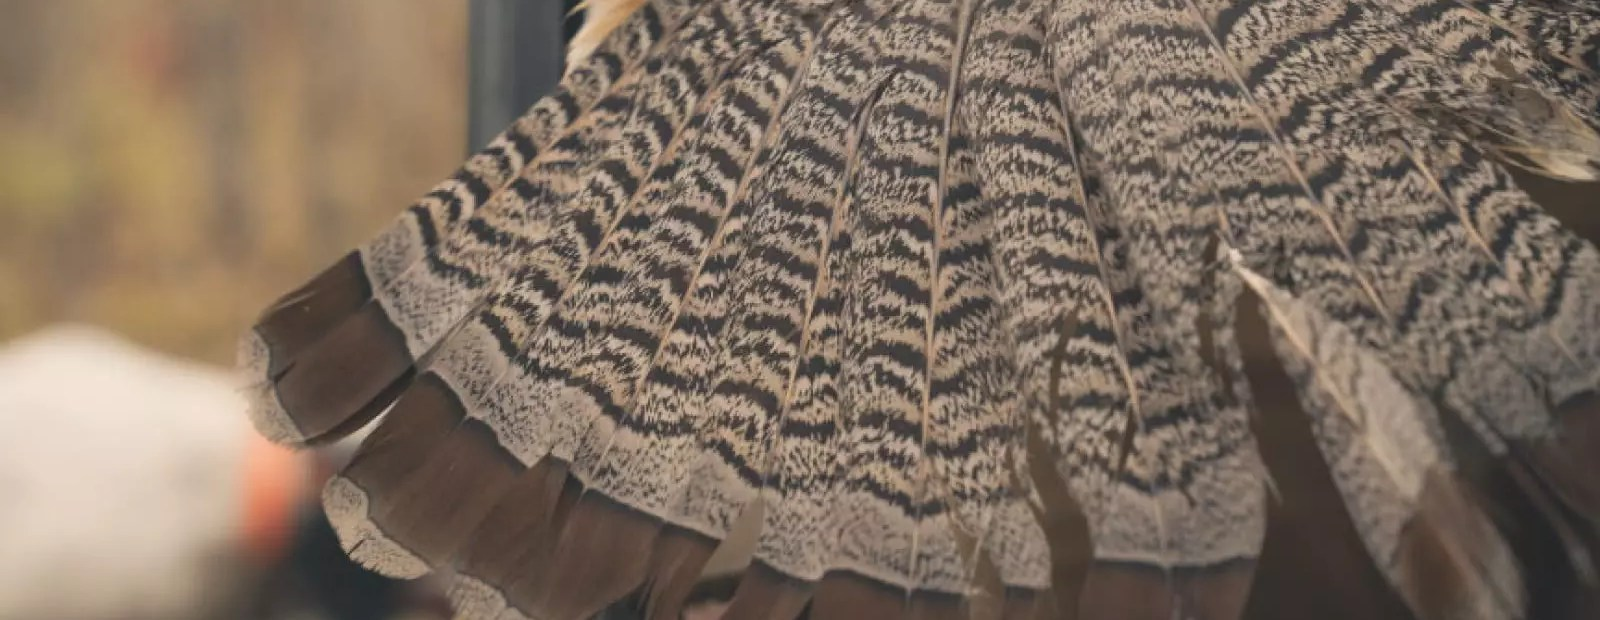 Ruffed Grouse Society Upland Survey